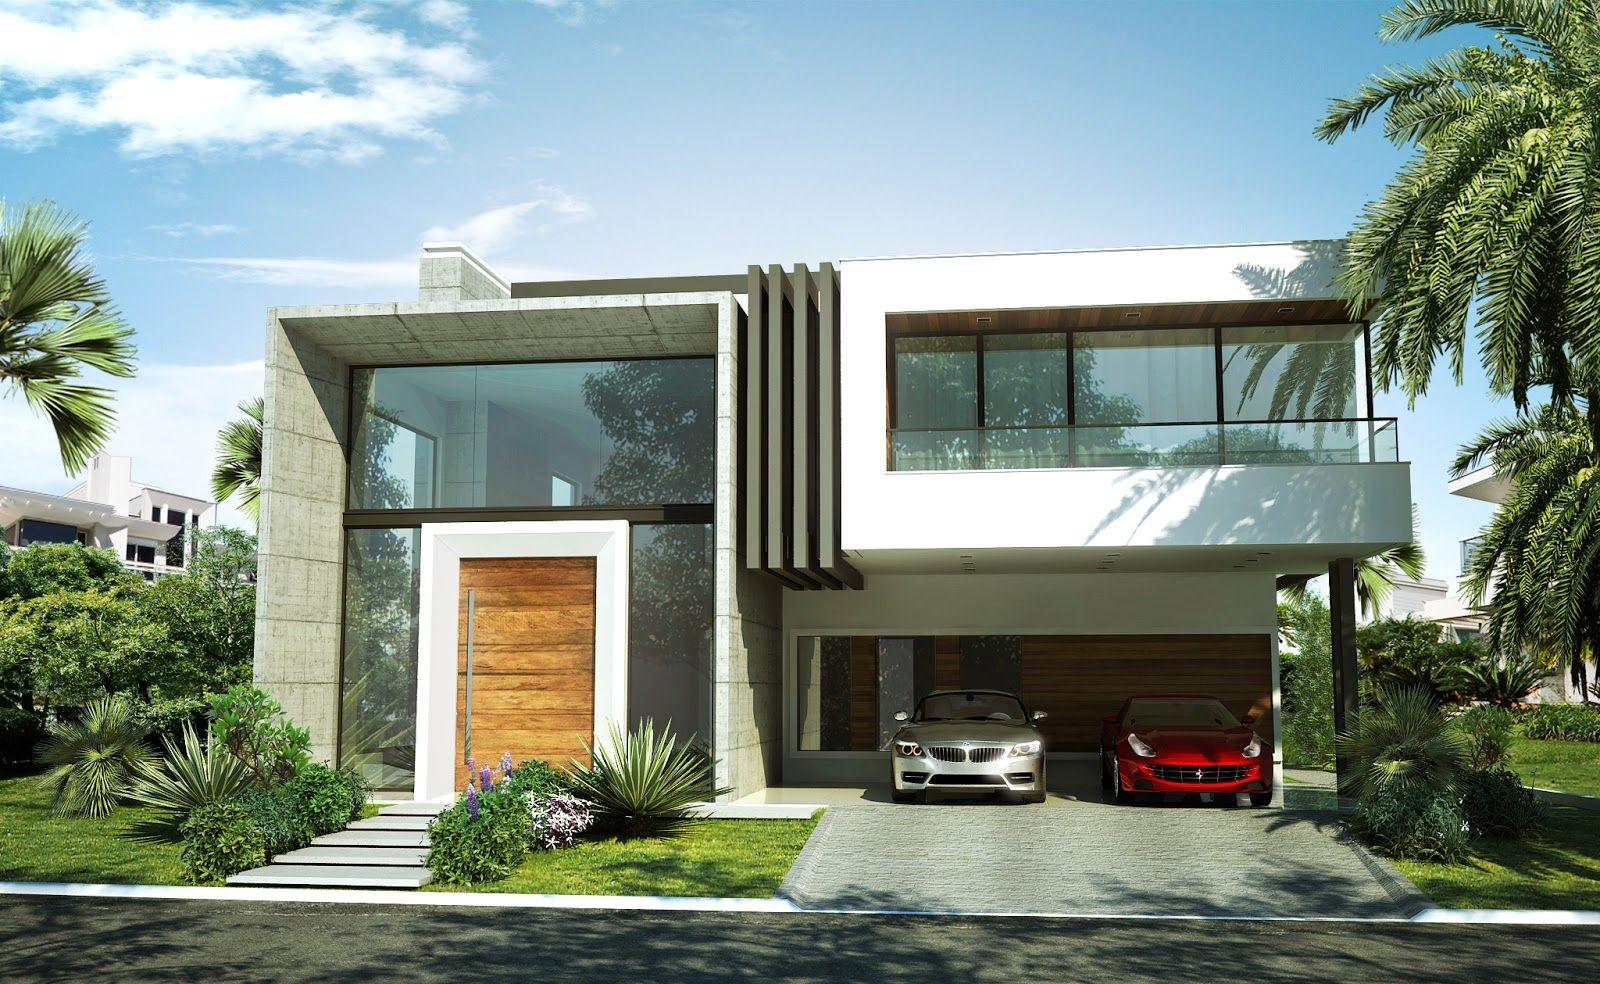 Zeka casa cinza 1600 984 arch architecture for Casas modernas renders